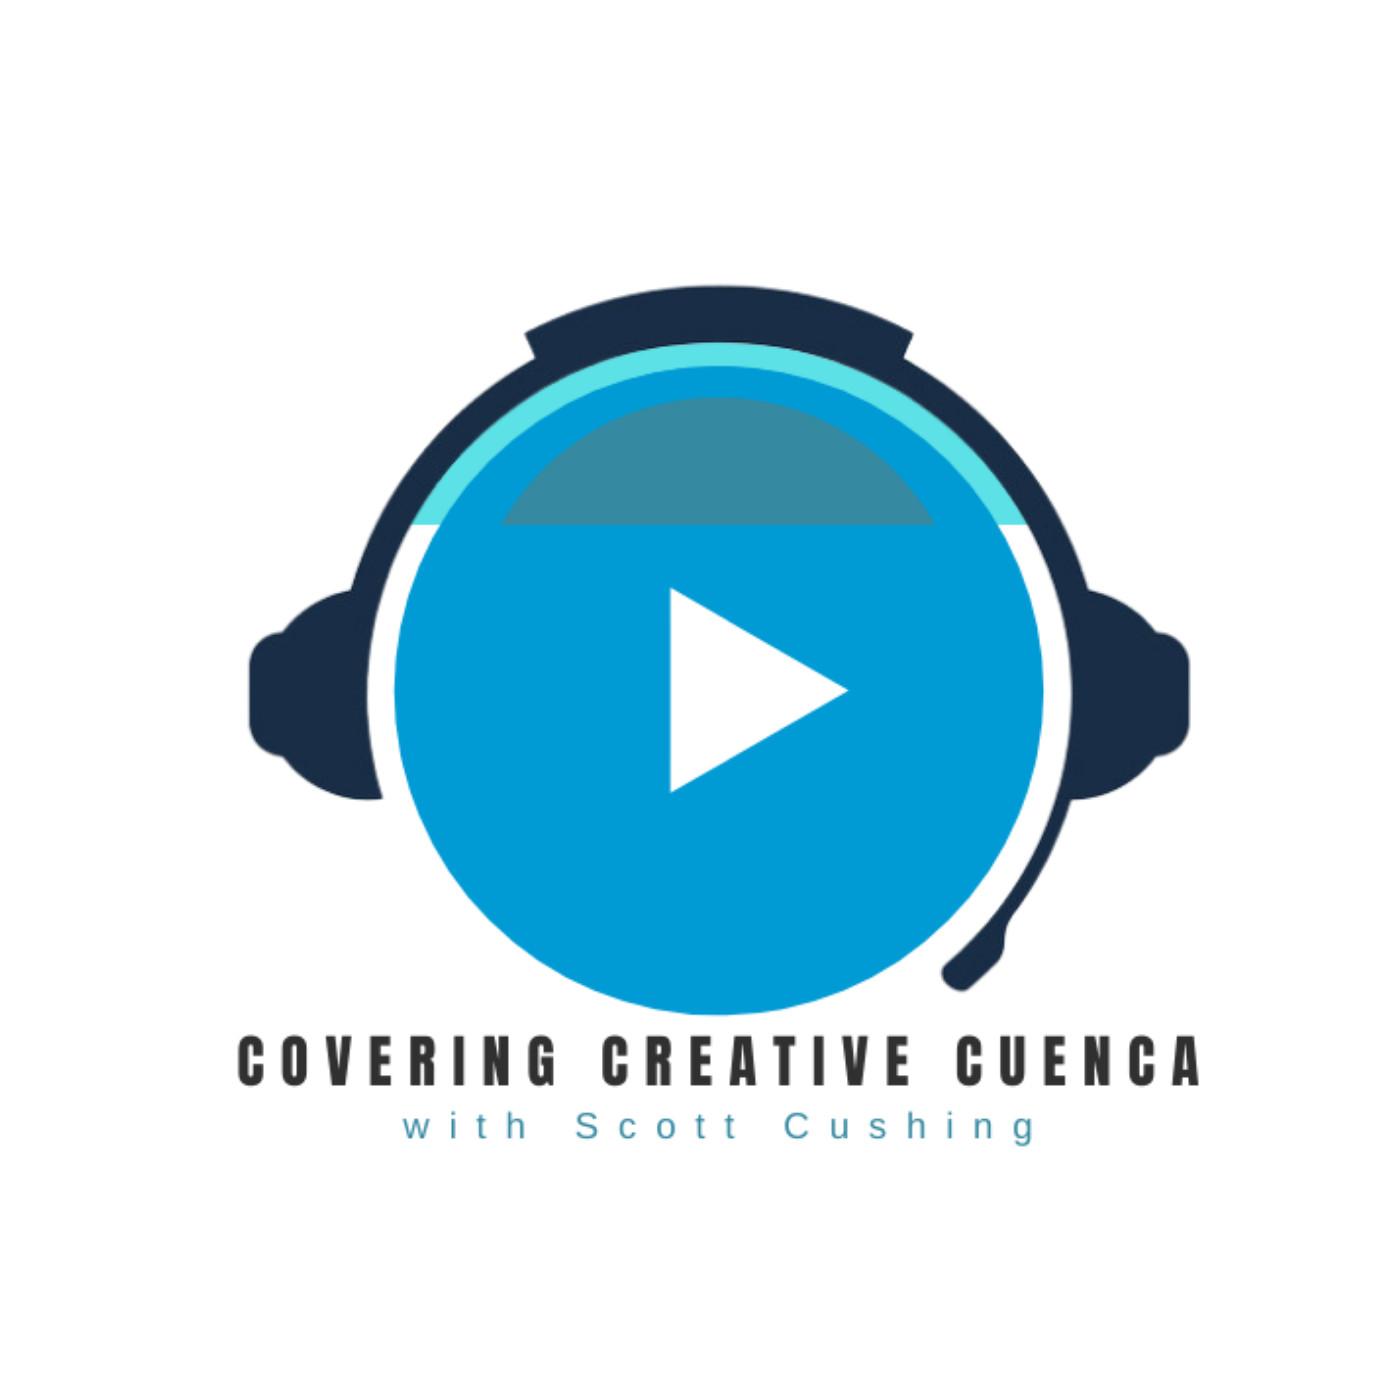 Covering Creative Cuenca